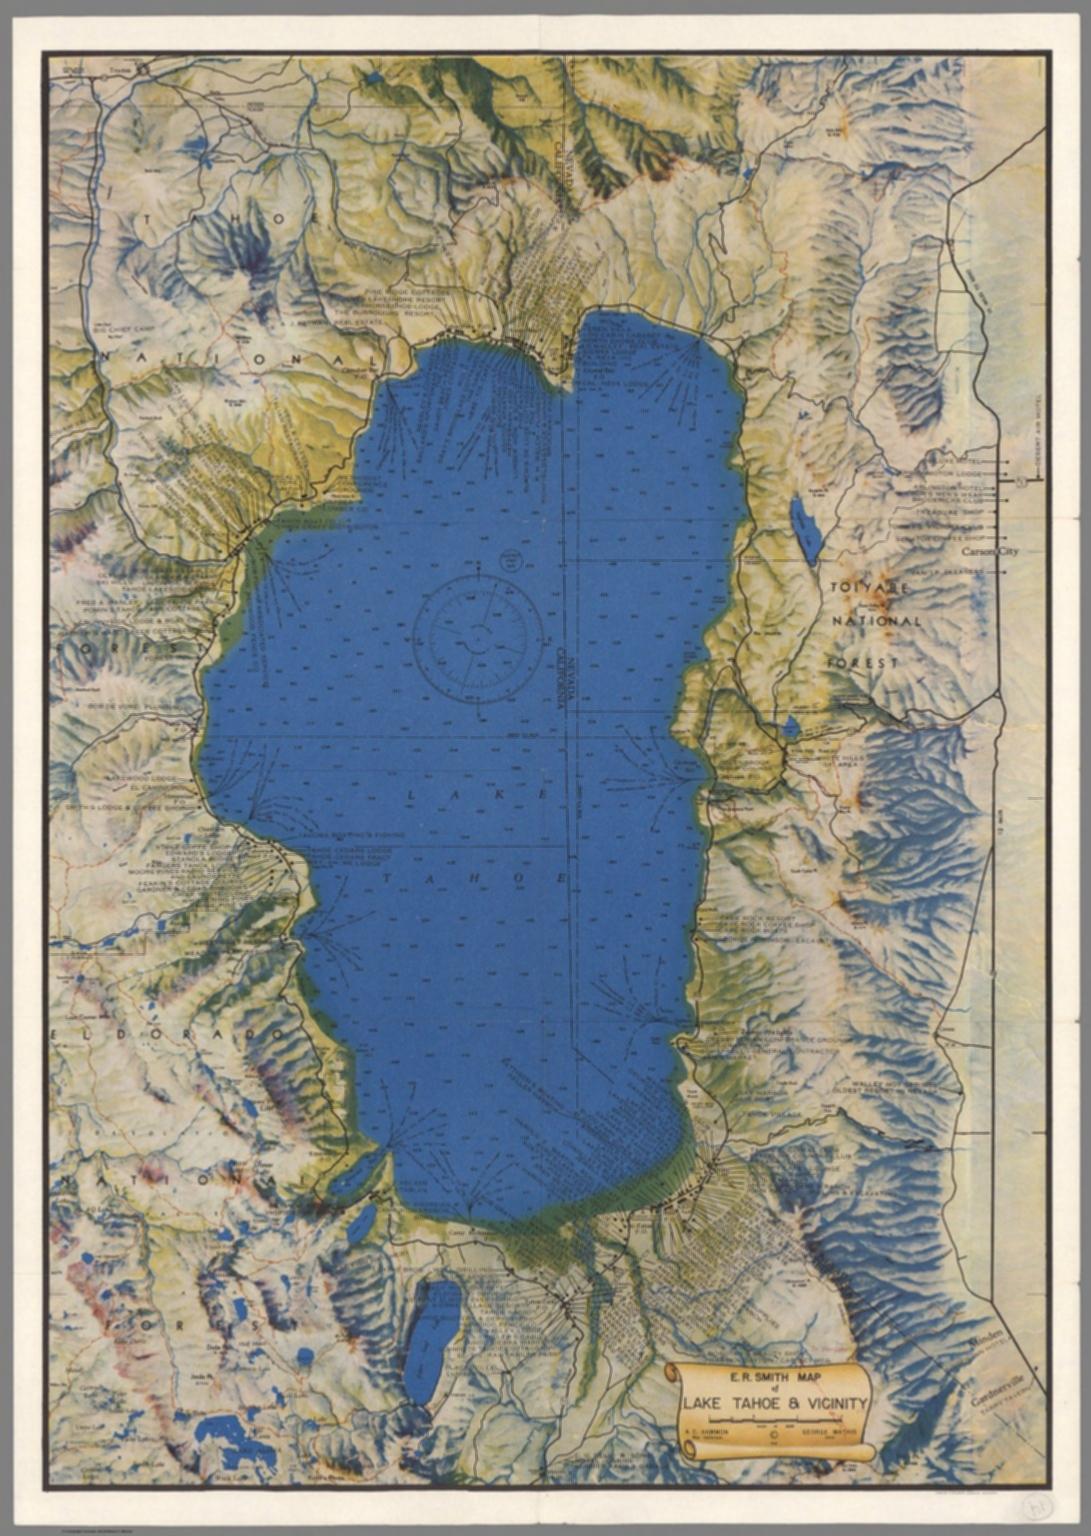 E.r. Smith Map Of Lake Tahoe & Vicinity - David Rumsey Historical - Printable Map Of Lake Tahoe